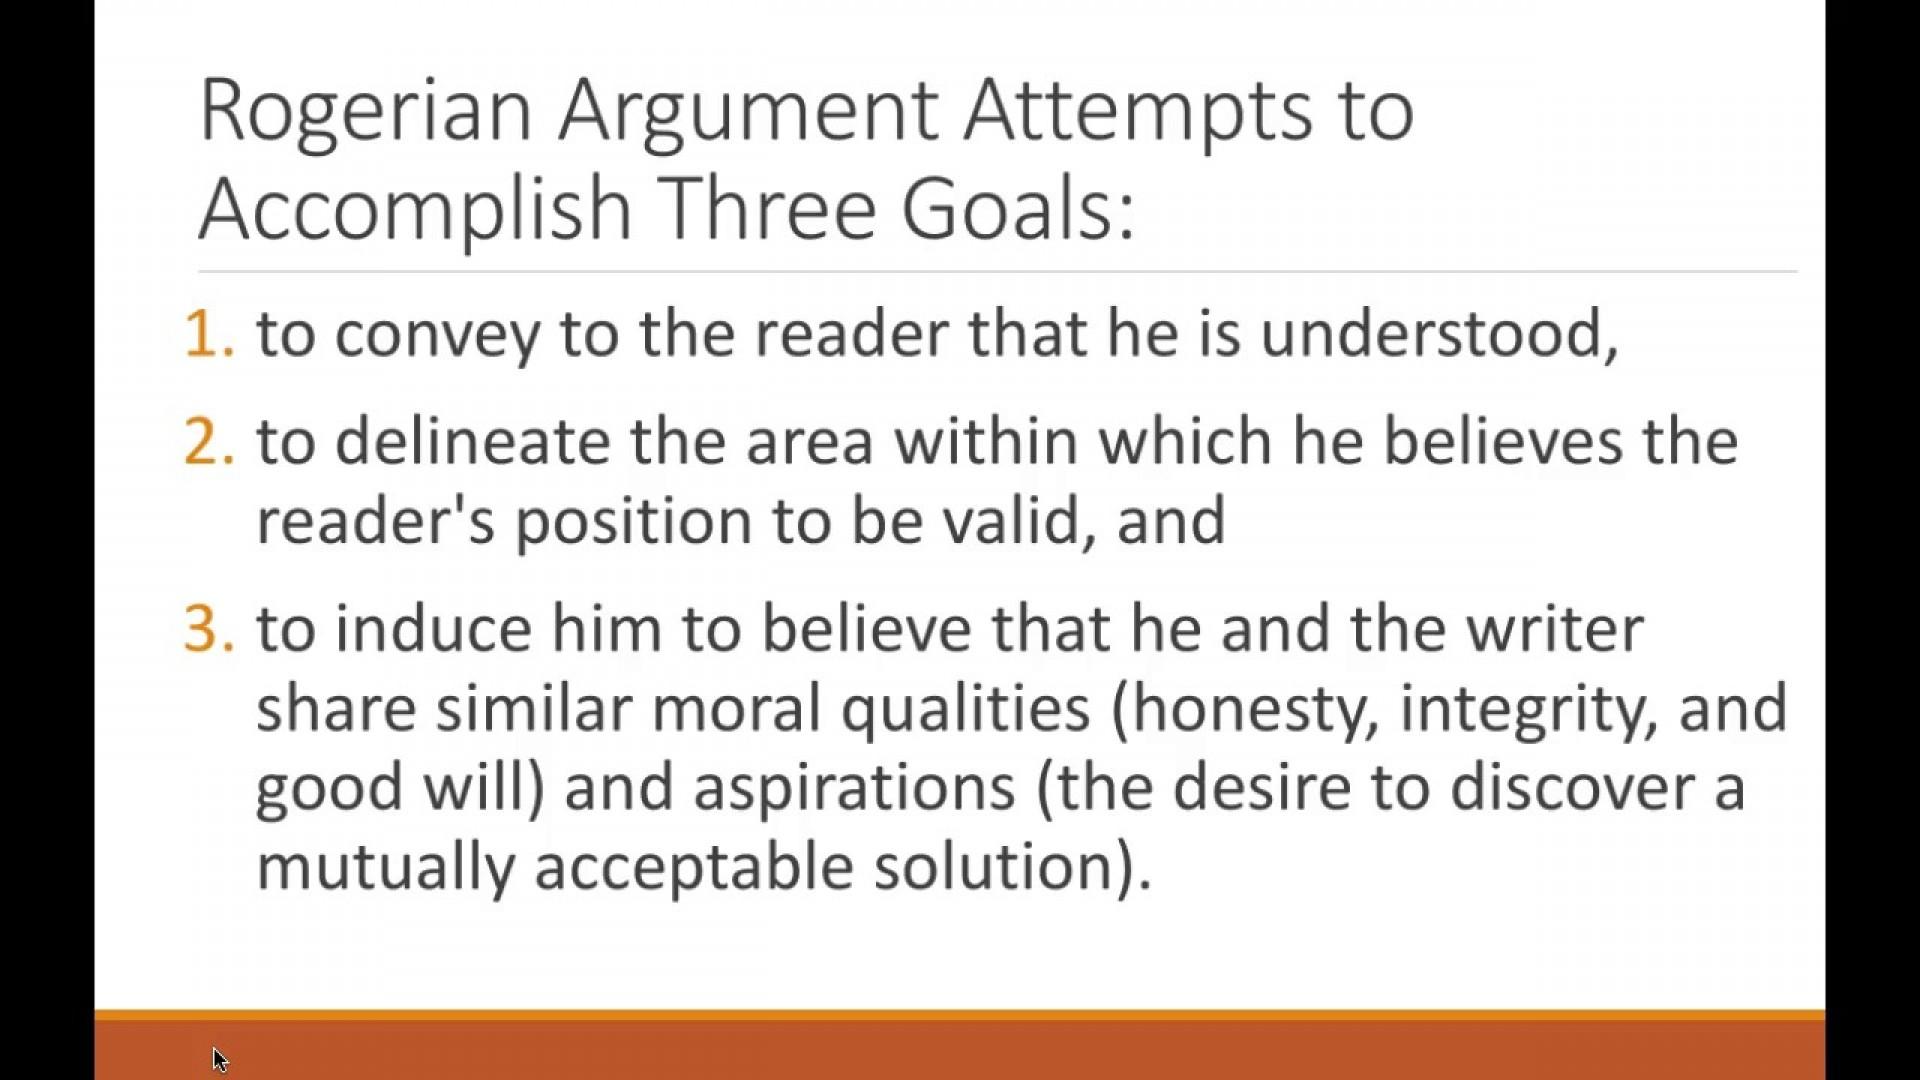 009 Essay Example Rogerian Best Argument Sentence Abortion Style Topics 1920